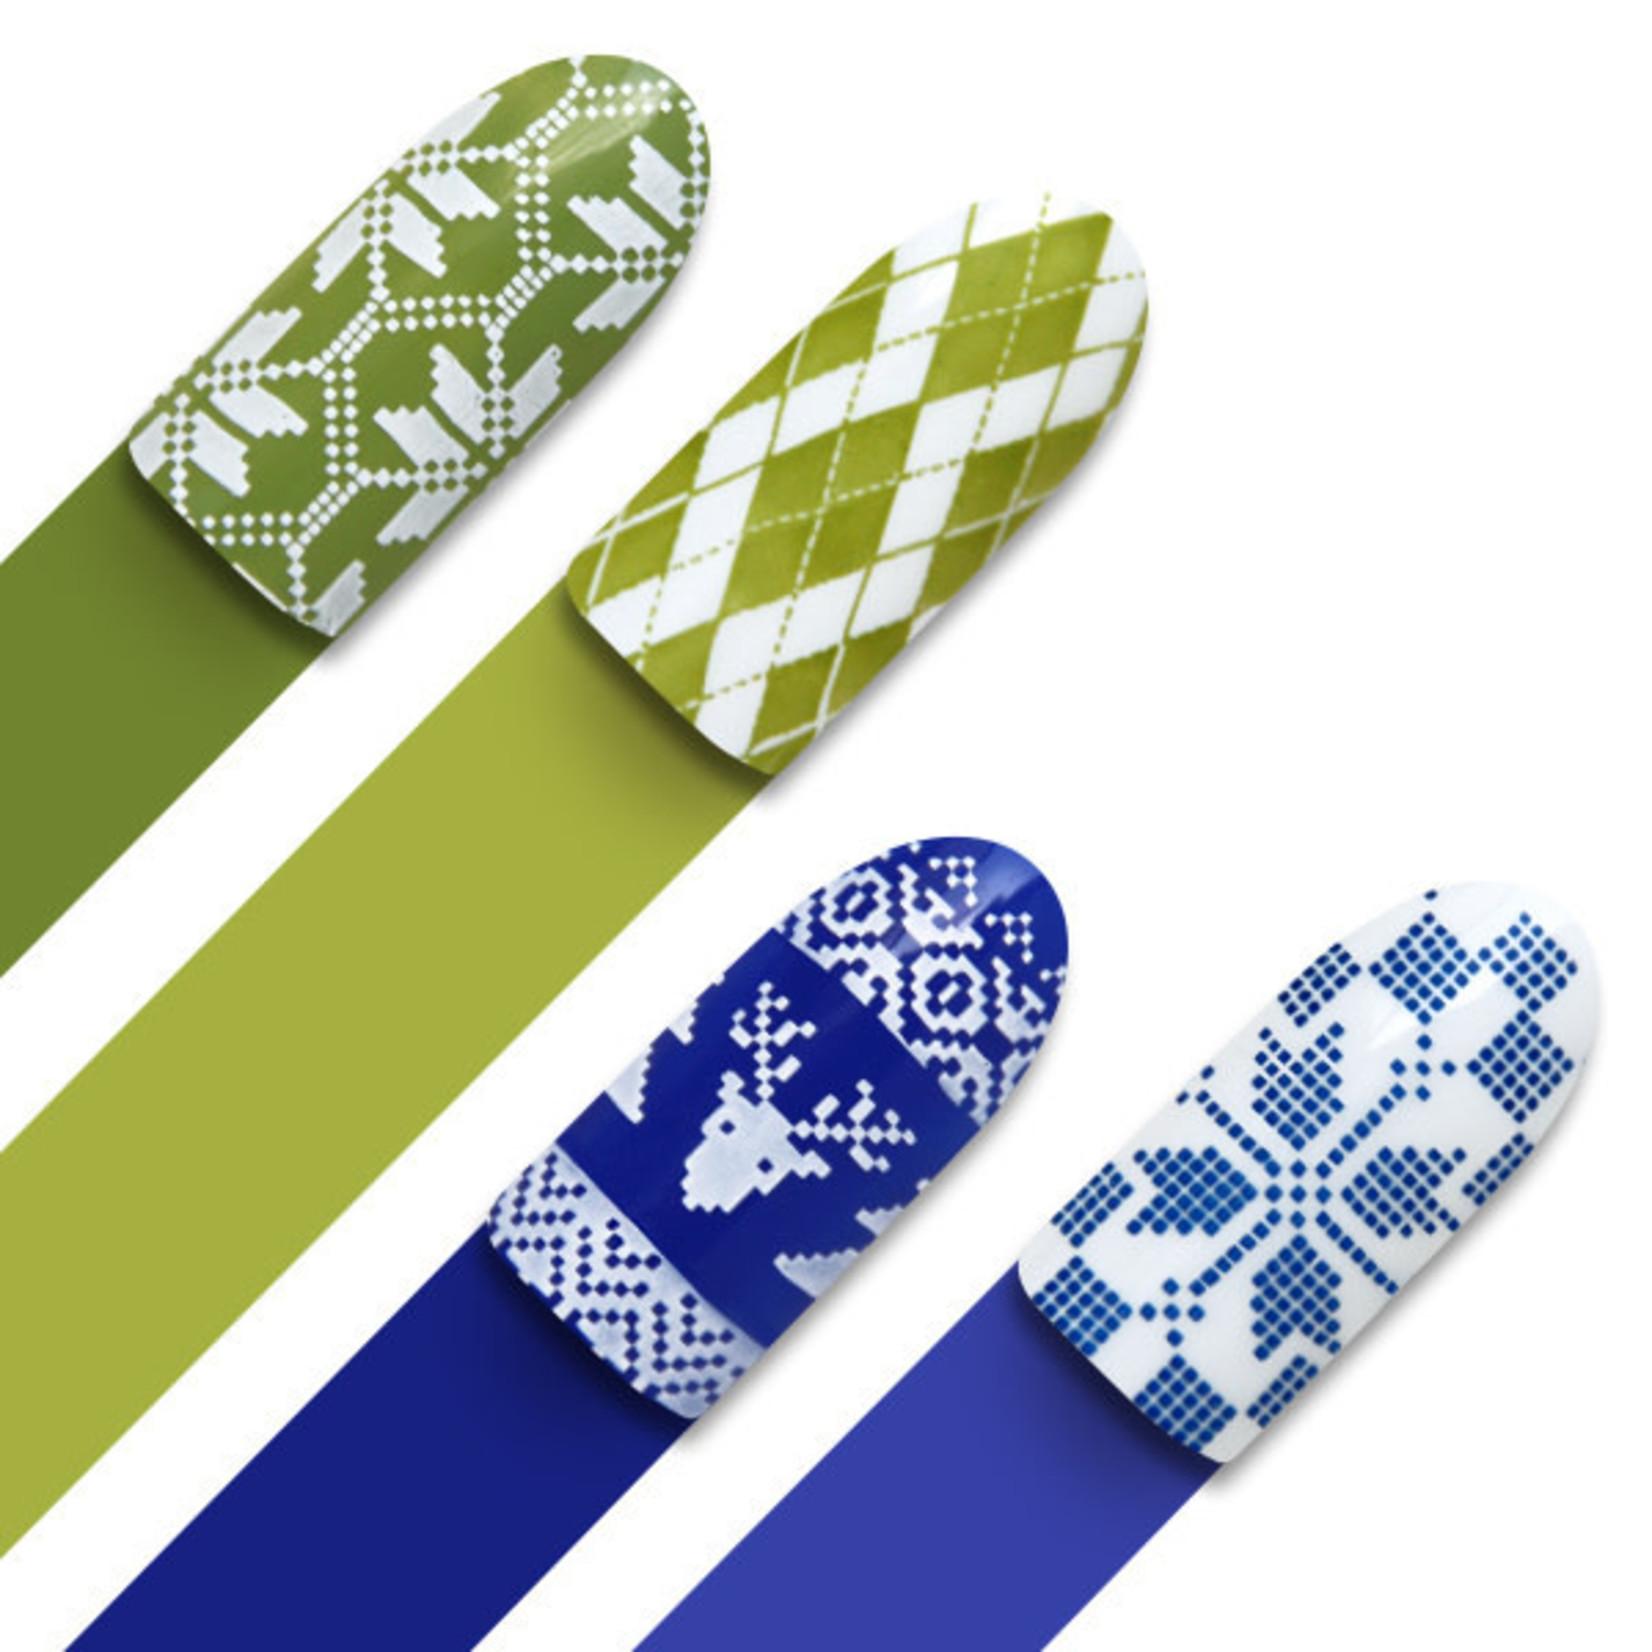 Moyra Moyra Stamping plate 02 Fabric texture